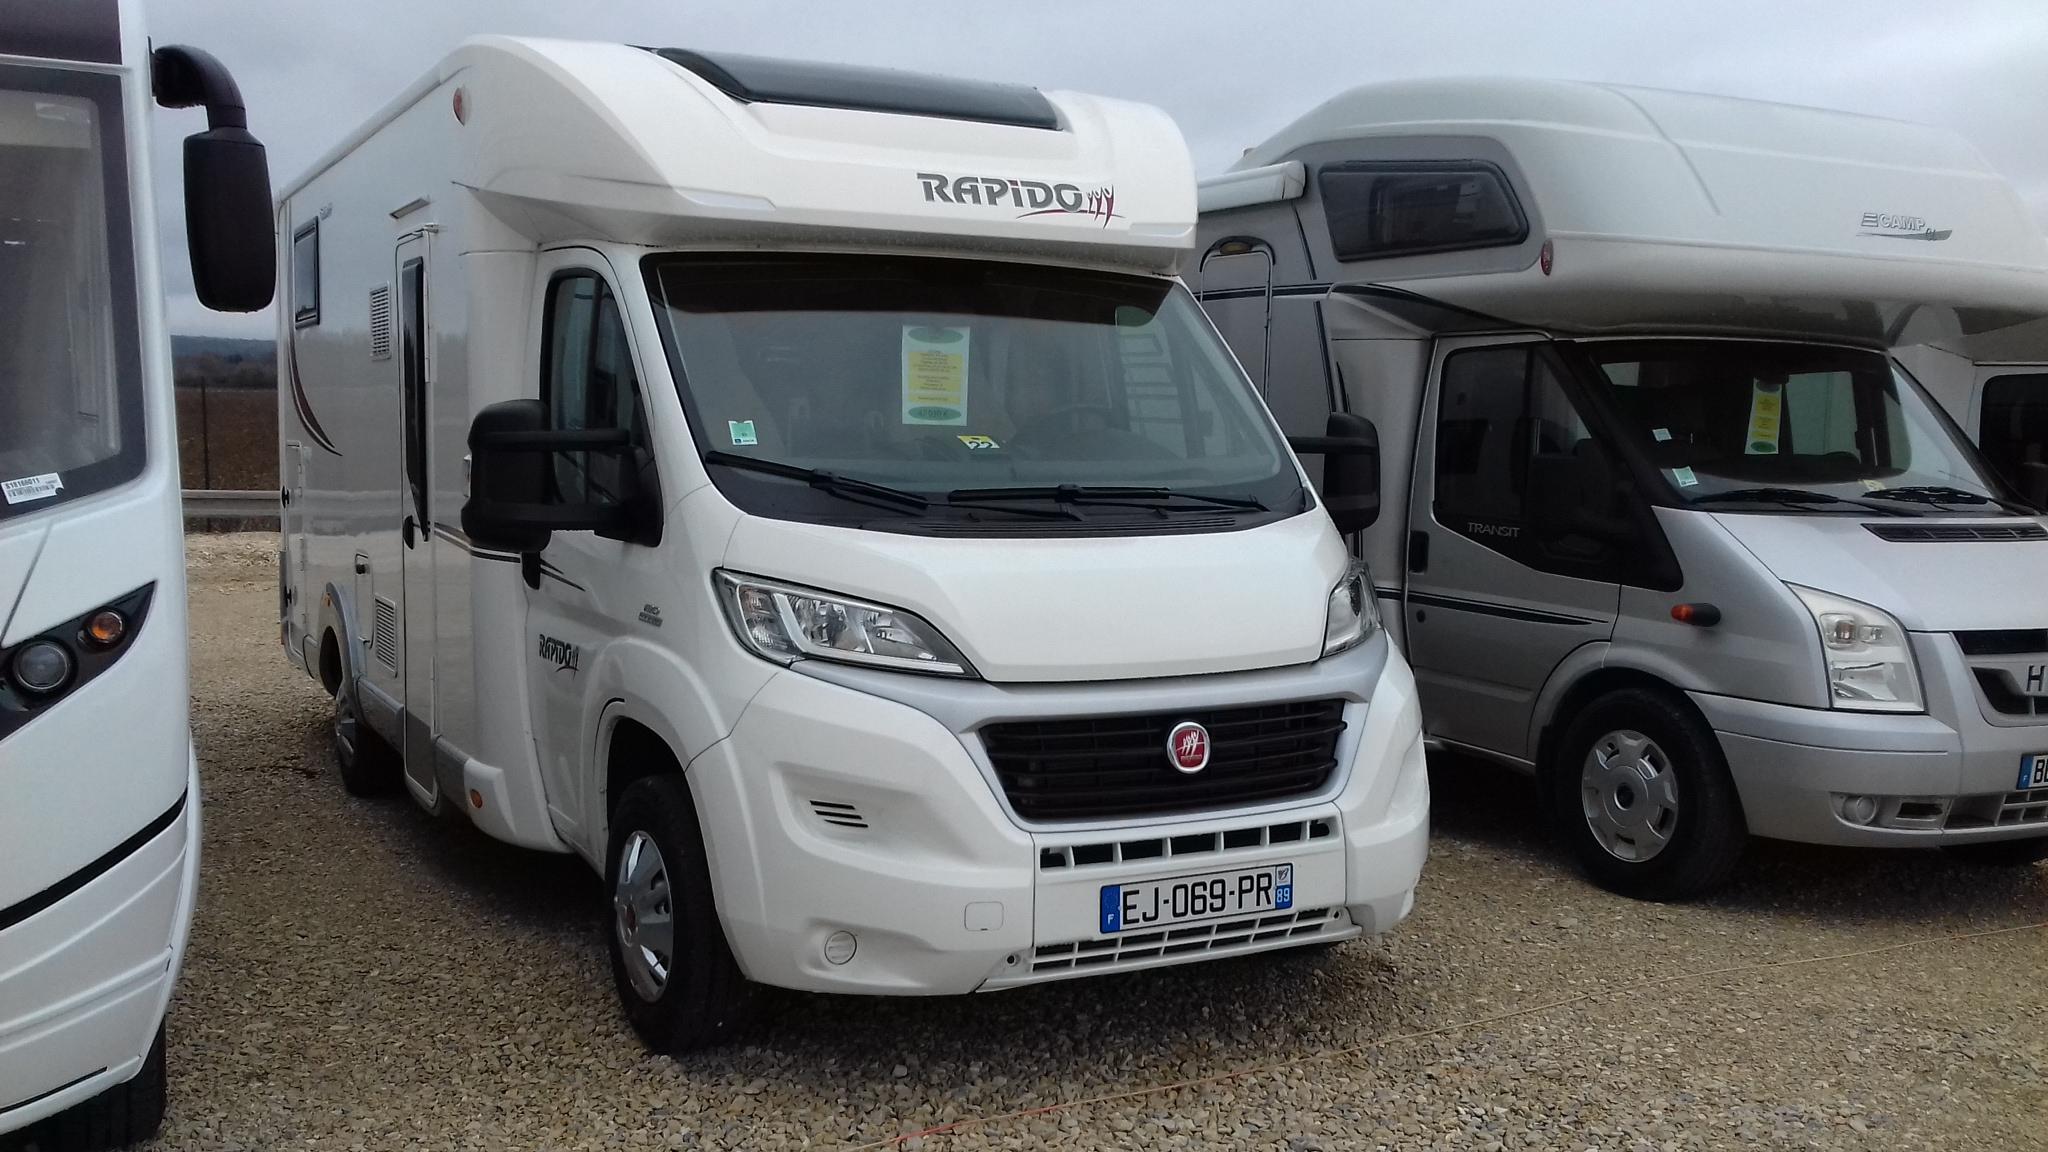 Rapido 680 ff occasion de 2017 fiat camping car en - Camping car rapido occasion lit central ...